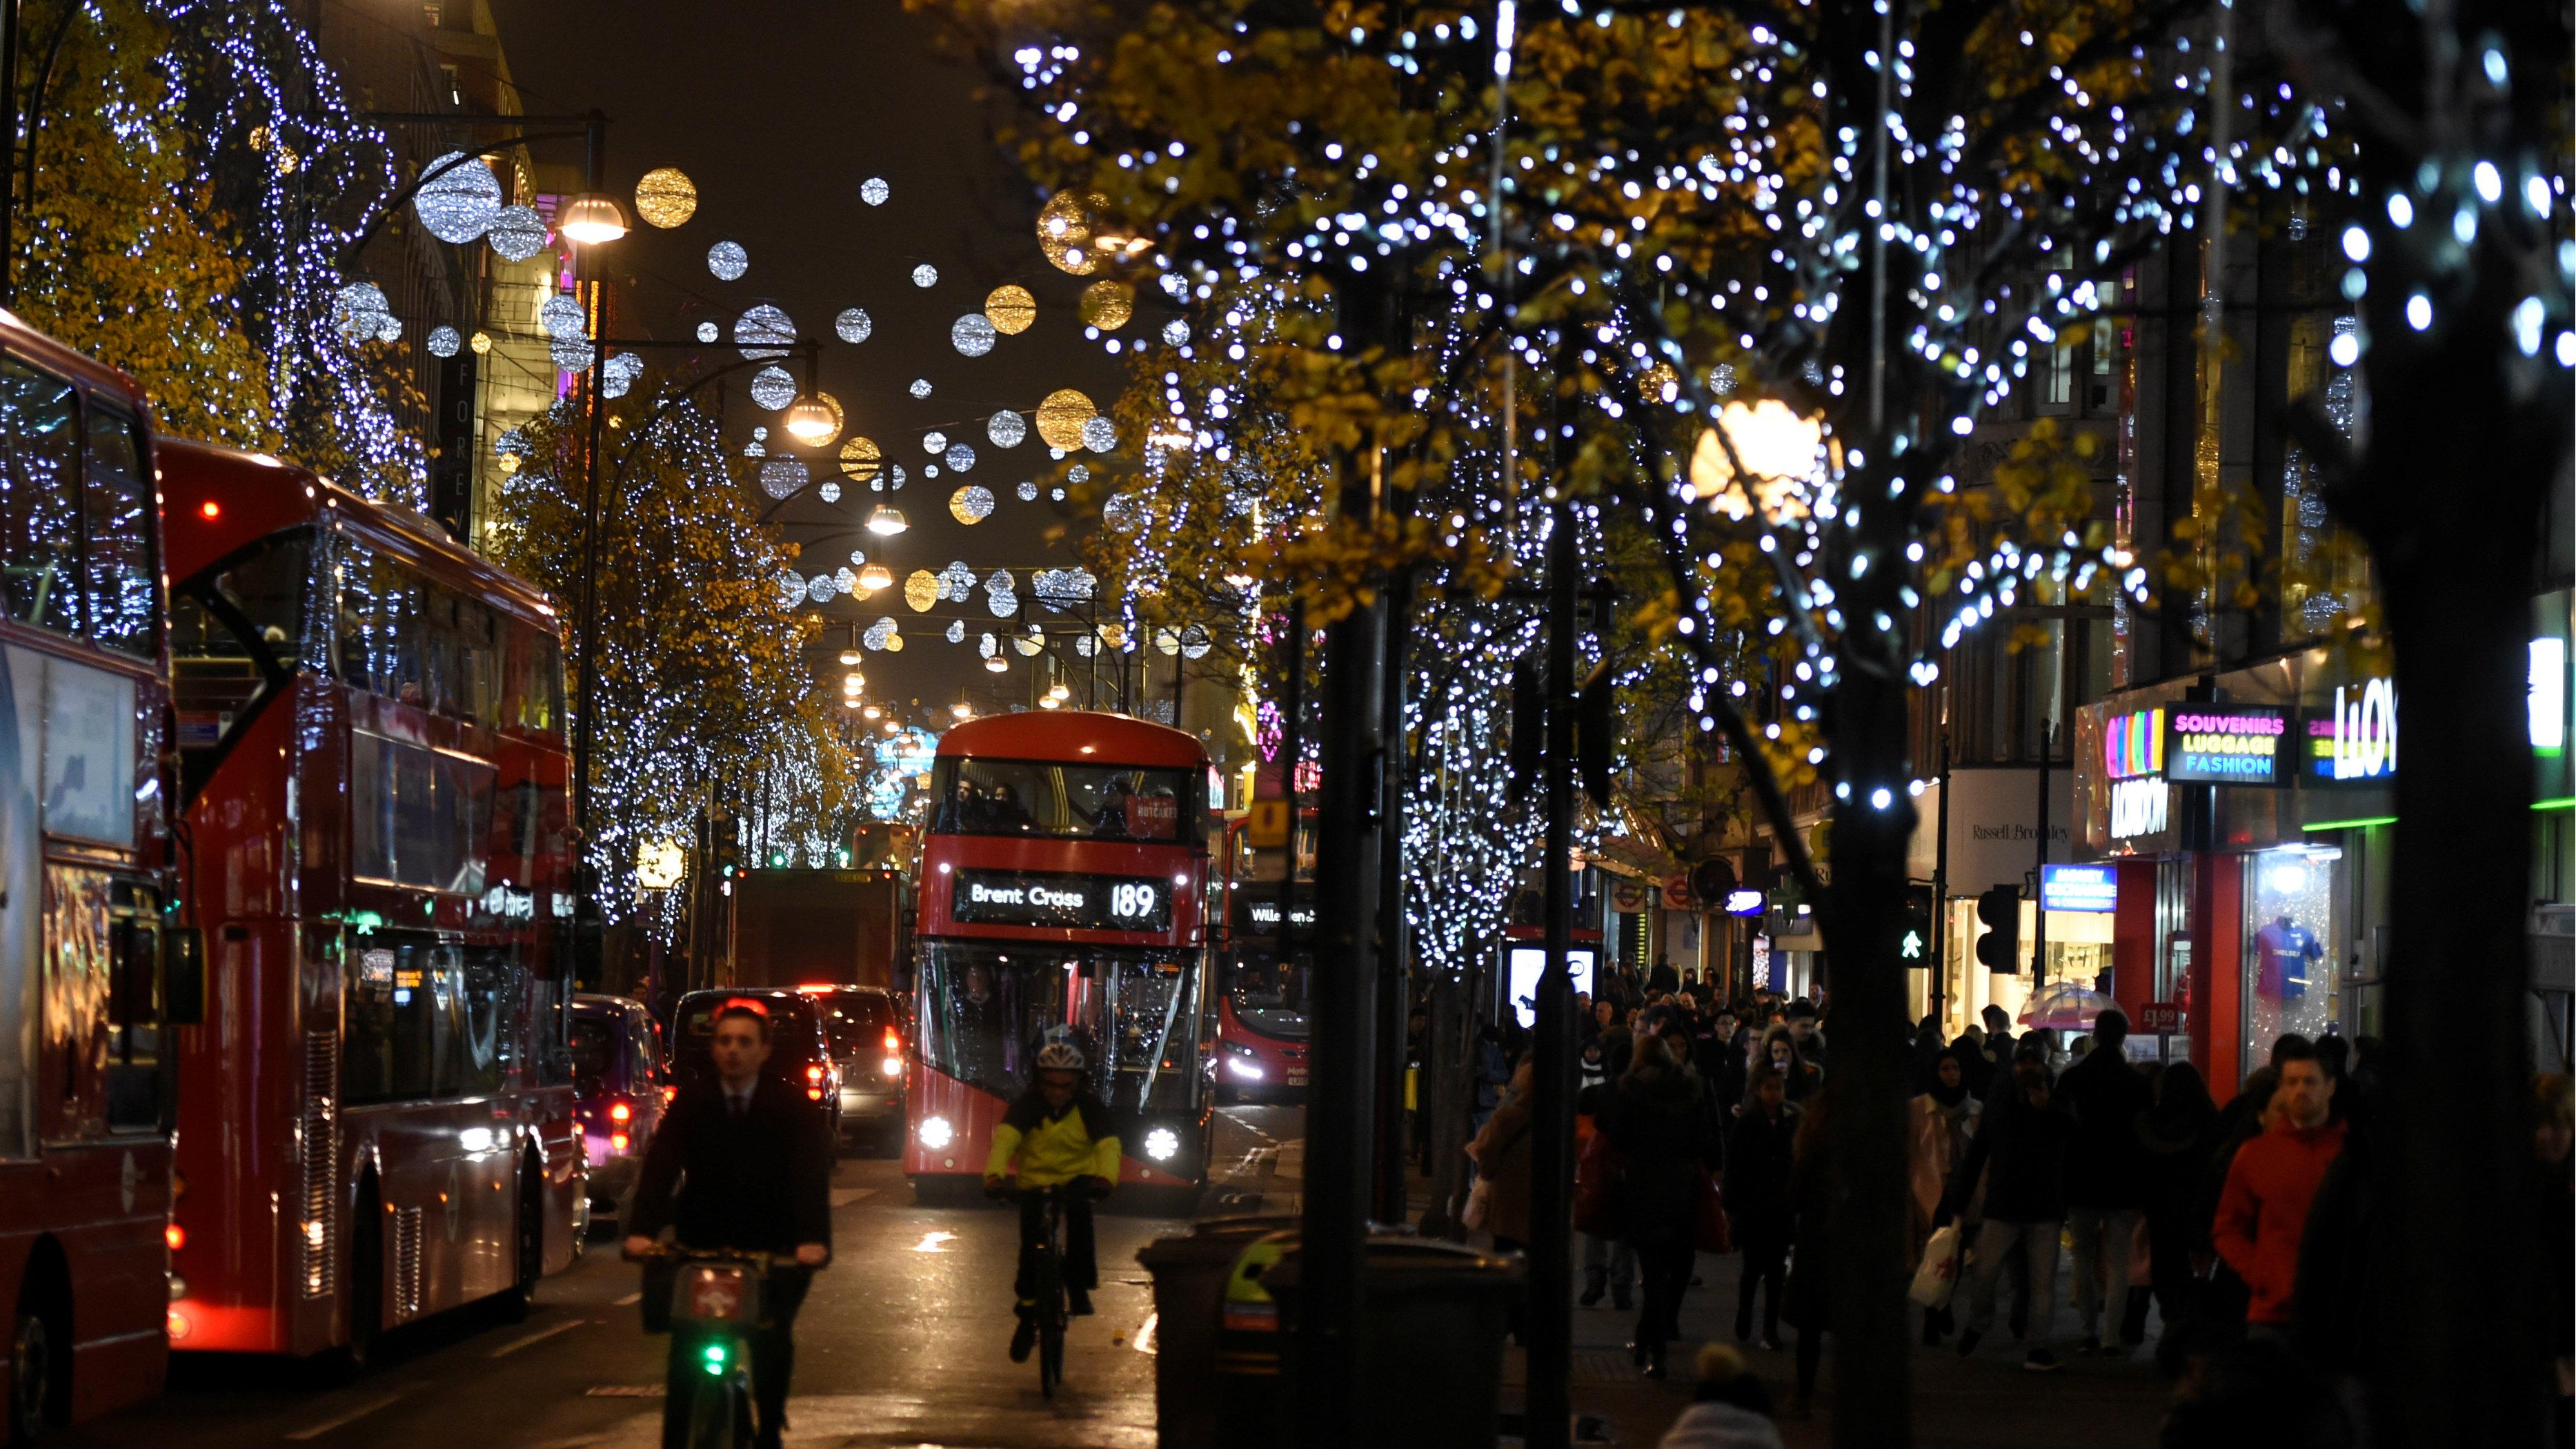 christmas lights are seen illuminated on oxford street in london